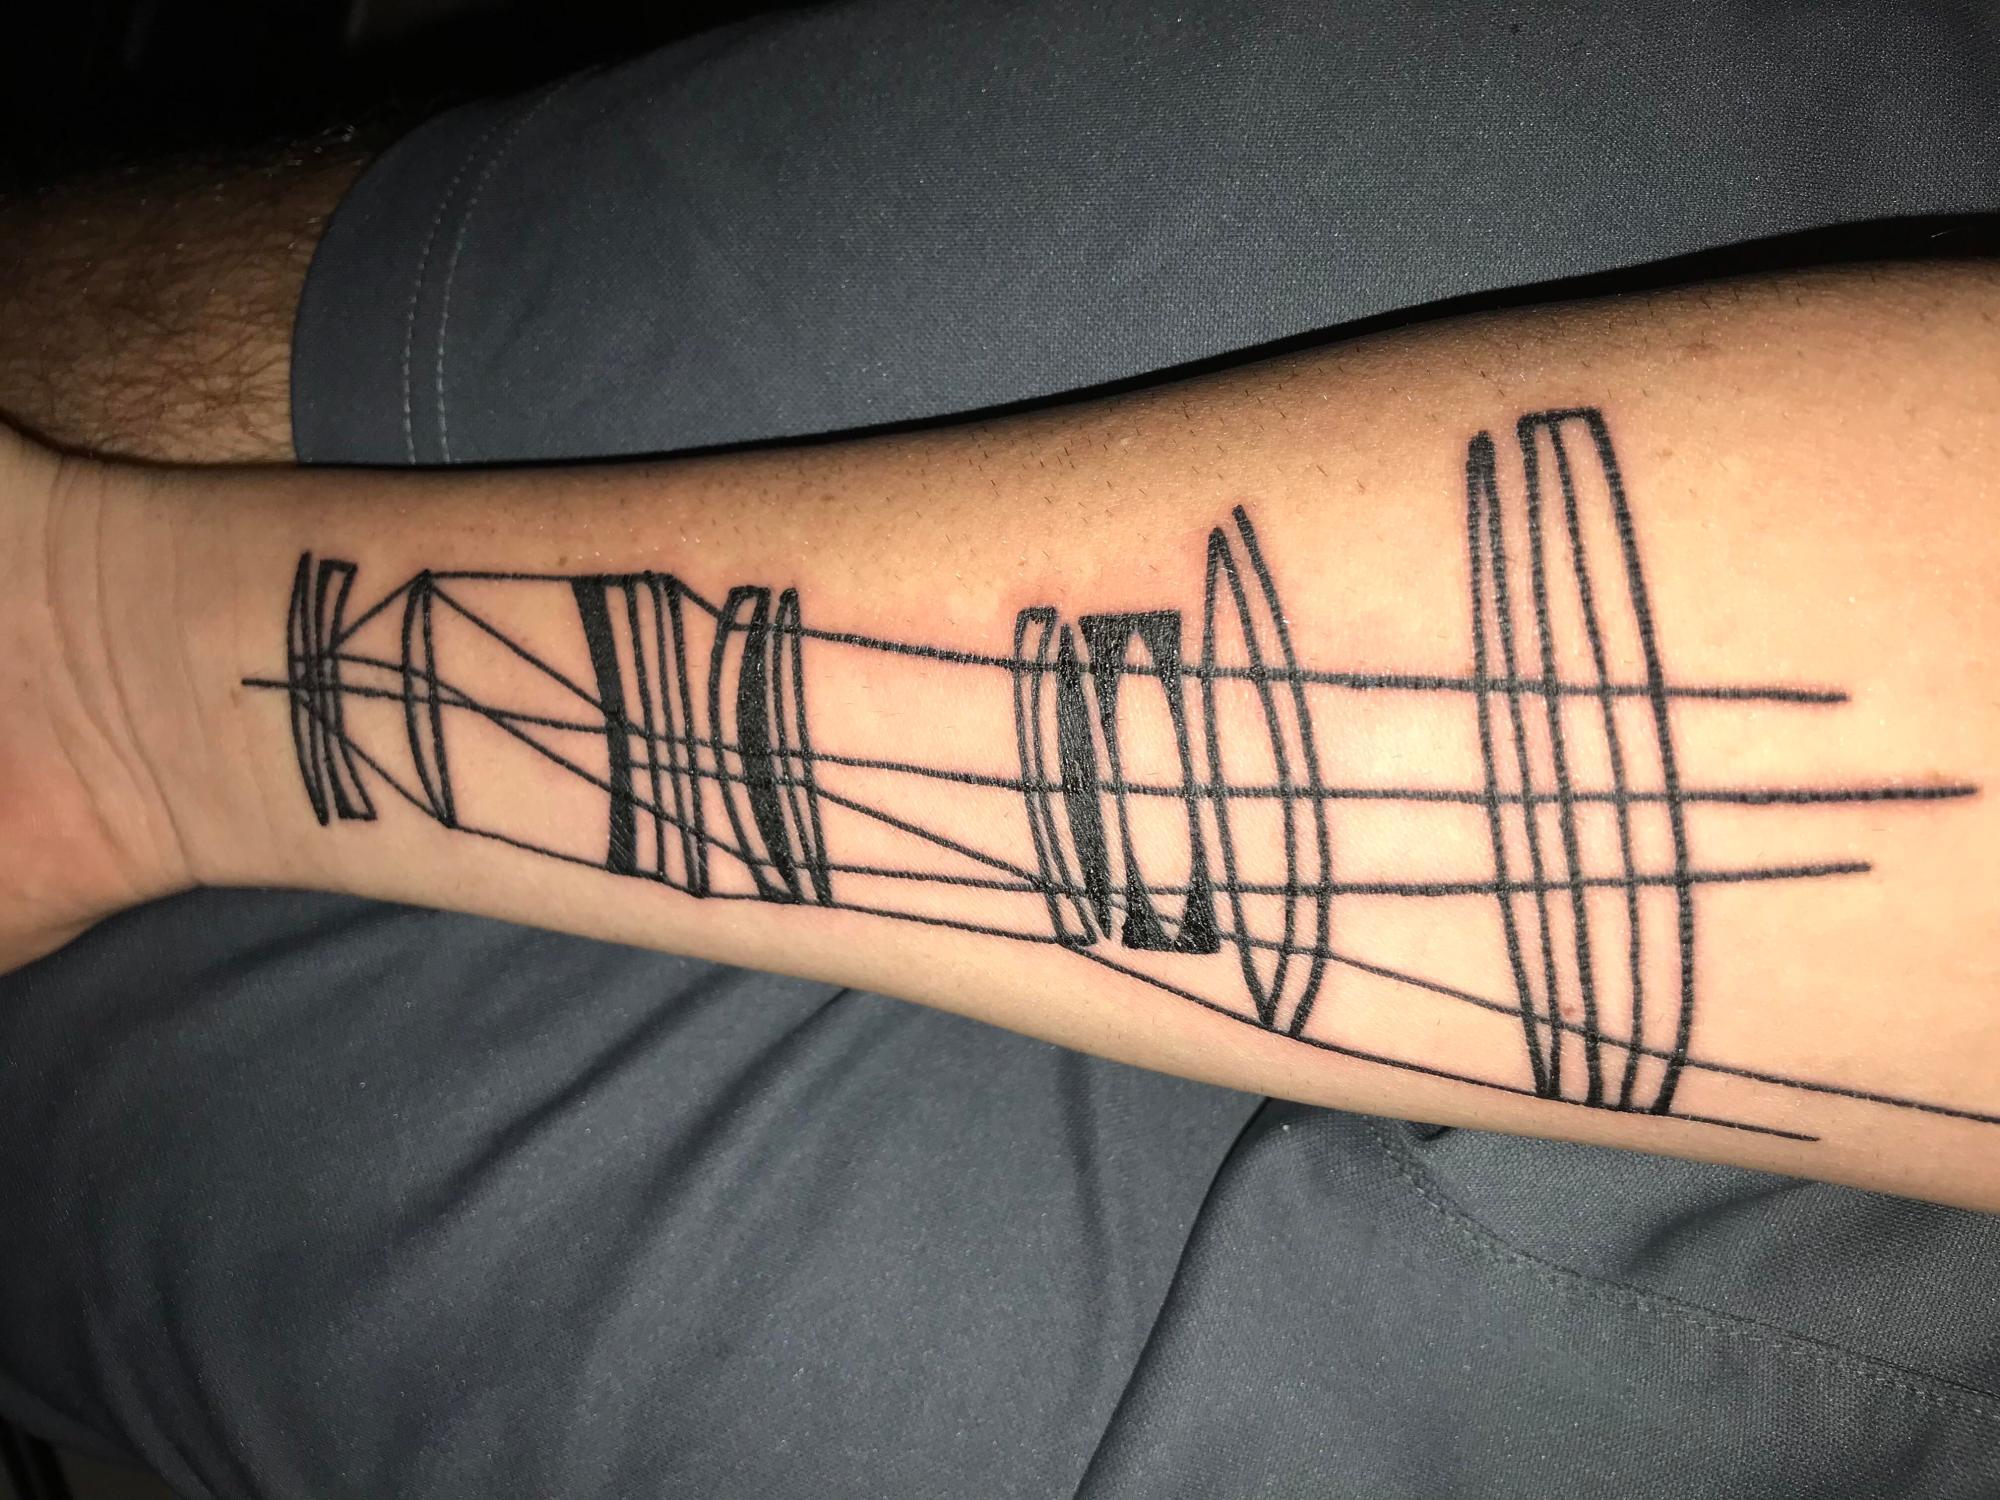 hight resolution of diagram of light traveling through lens elements michael at homesick tattoos orlando